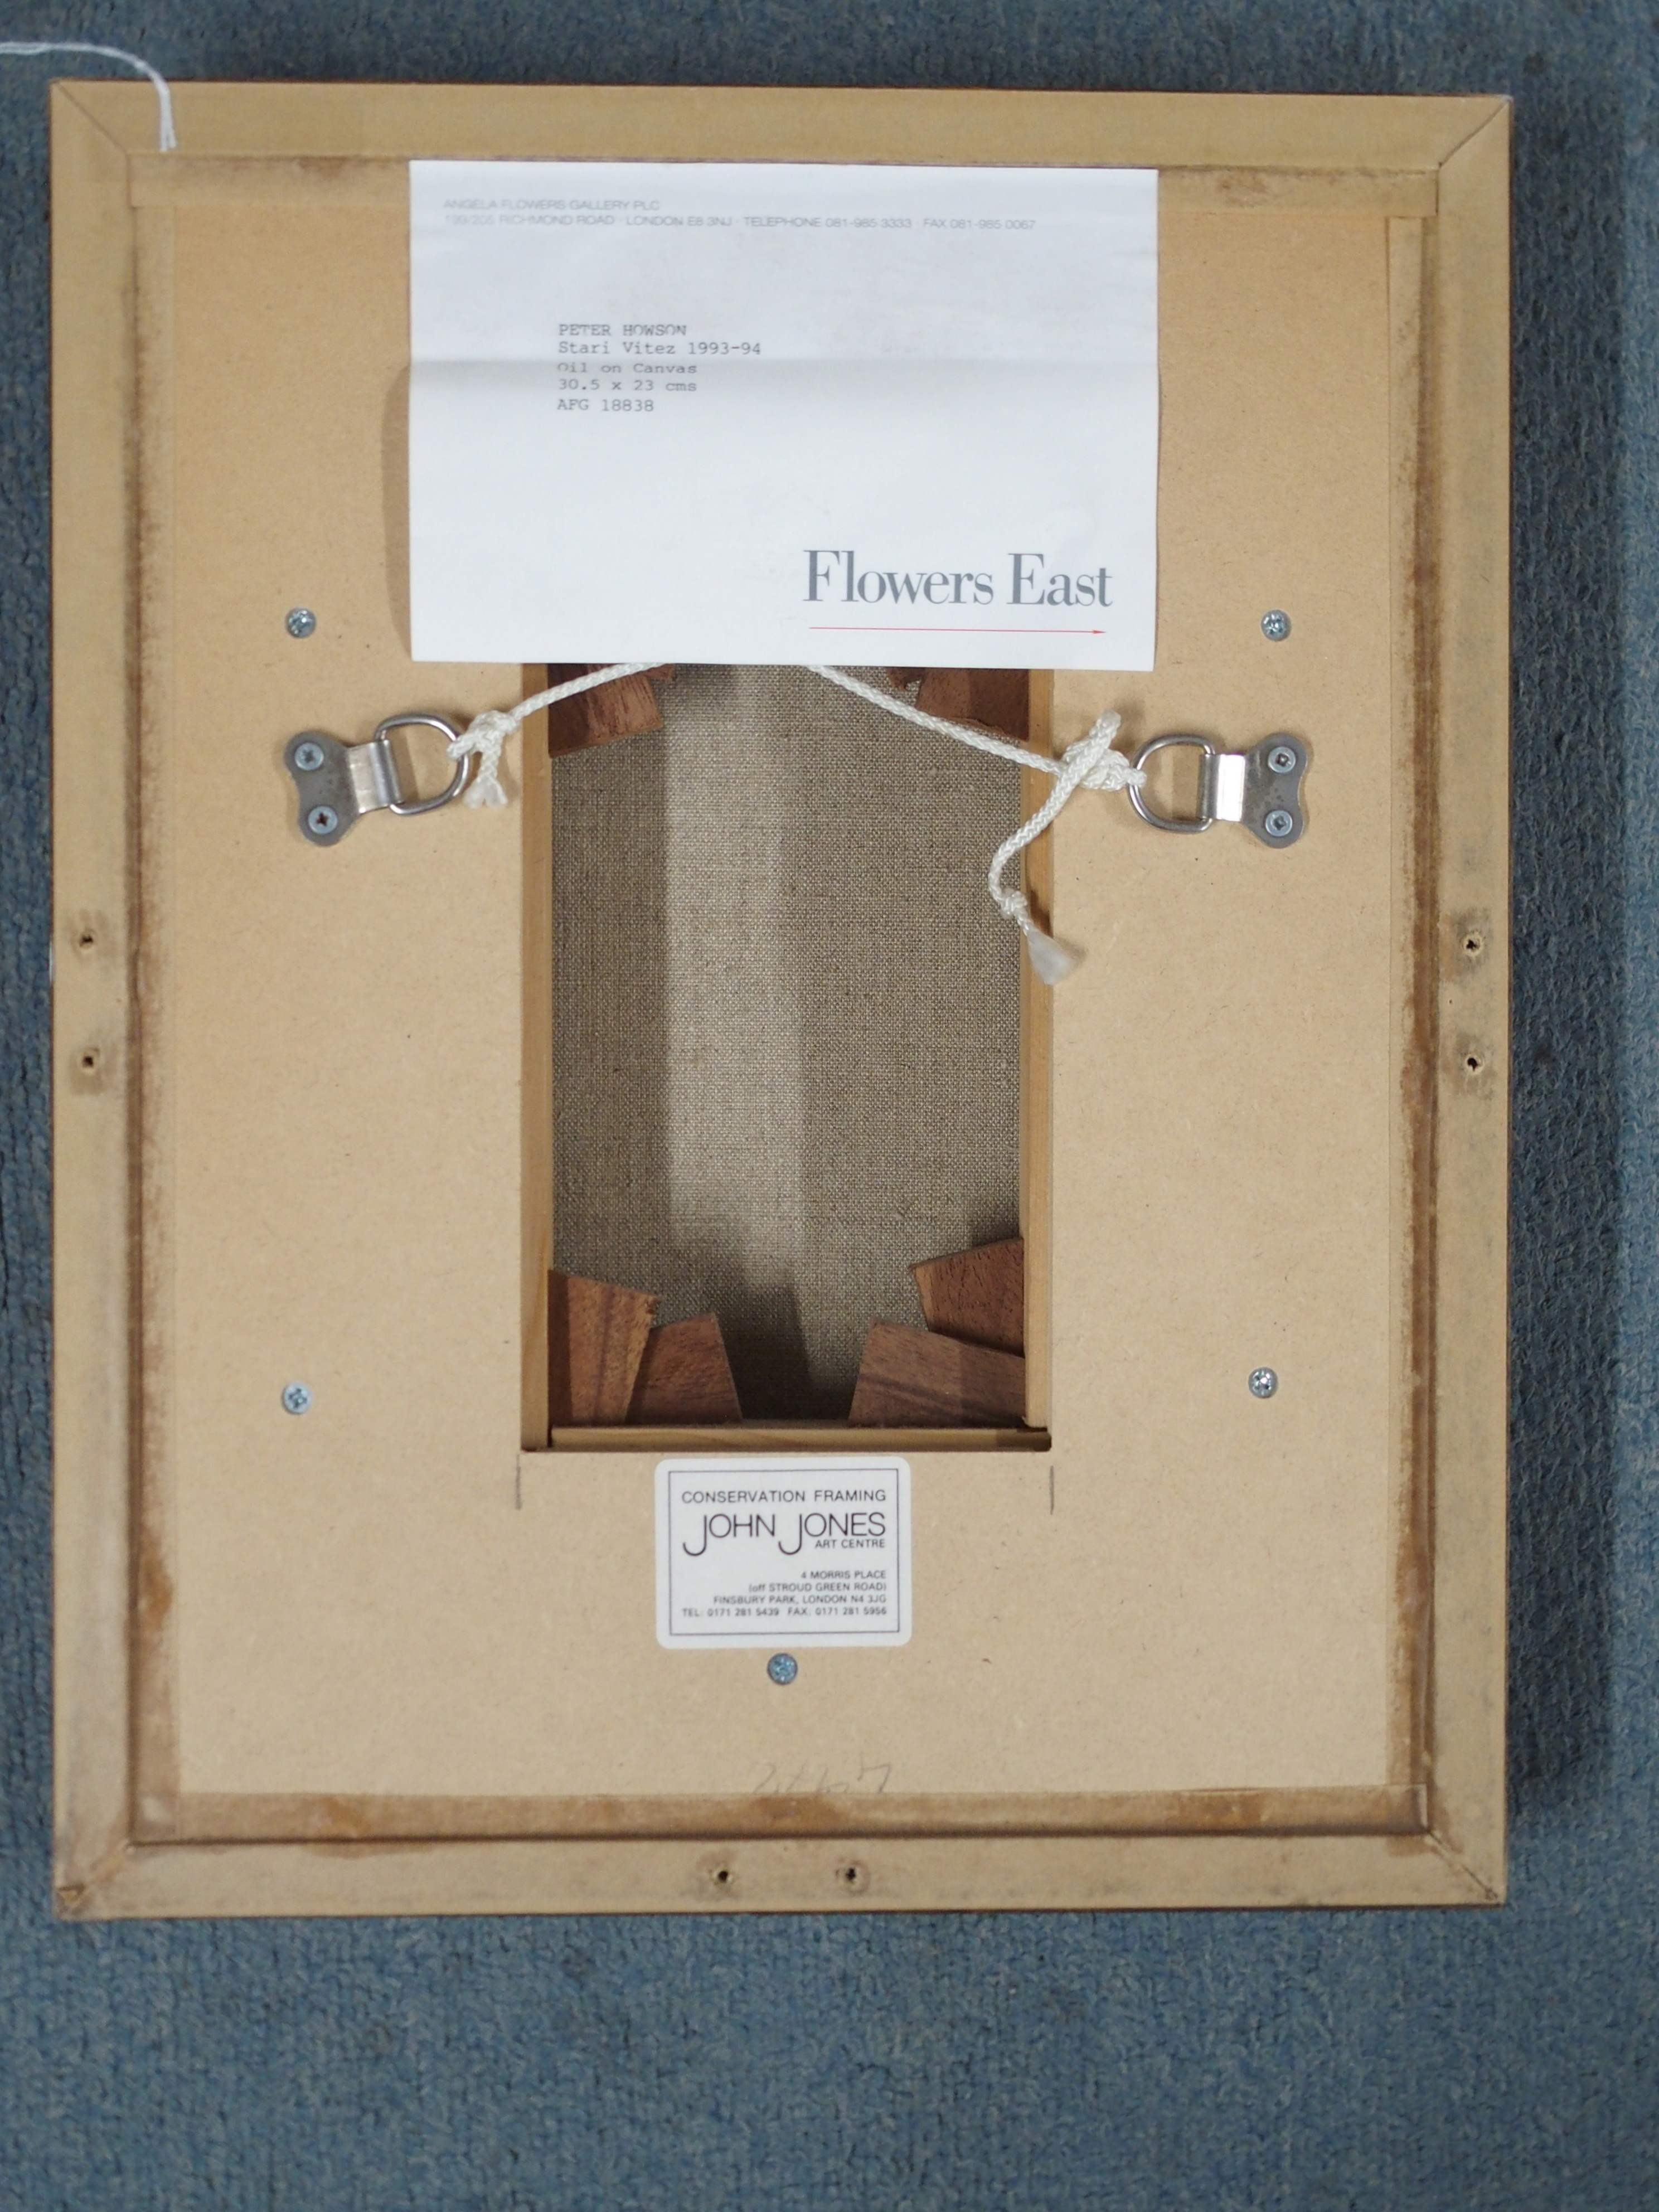 "•PETER HOWSON OBE (SCOTTISH B. 1958) STARI VITEZ Oil on canvas, 30.5 x 23cm (12 x 8 1/2"") - Image 4 of 4"